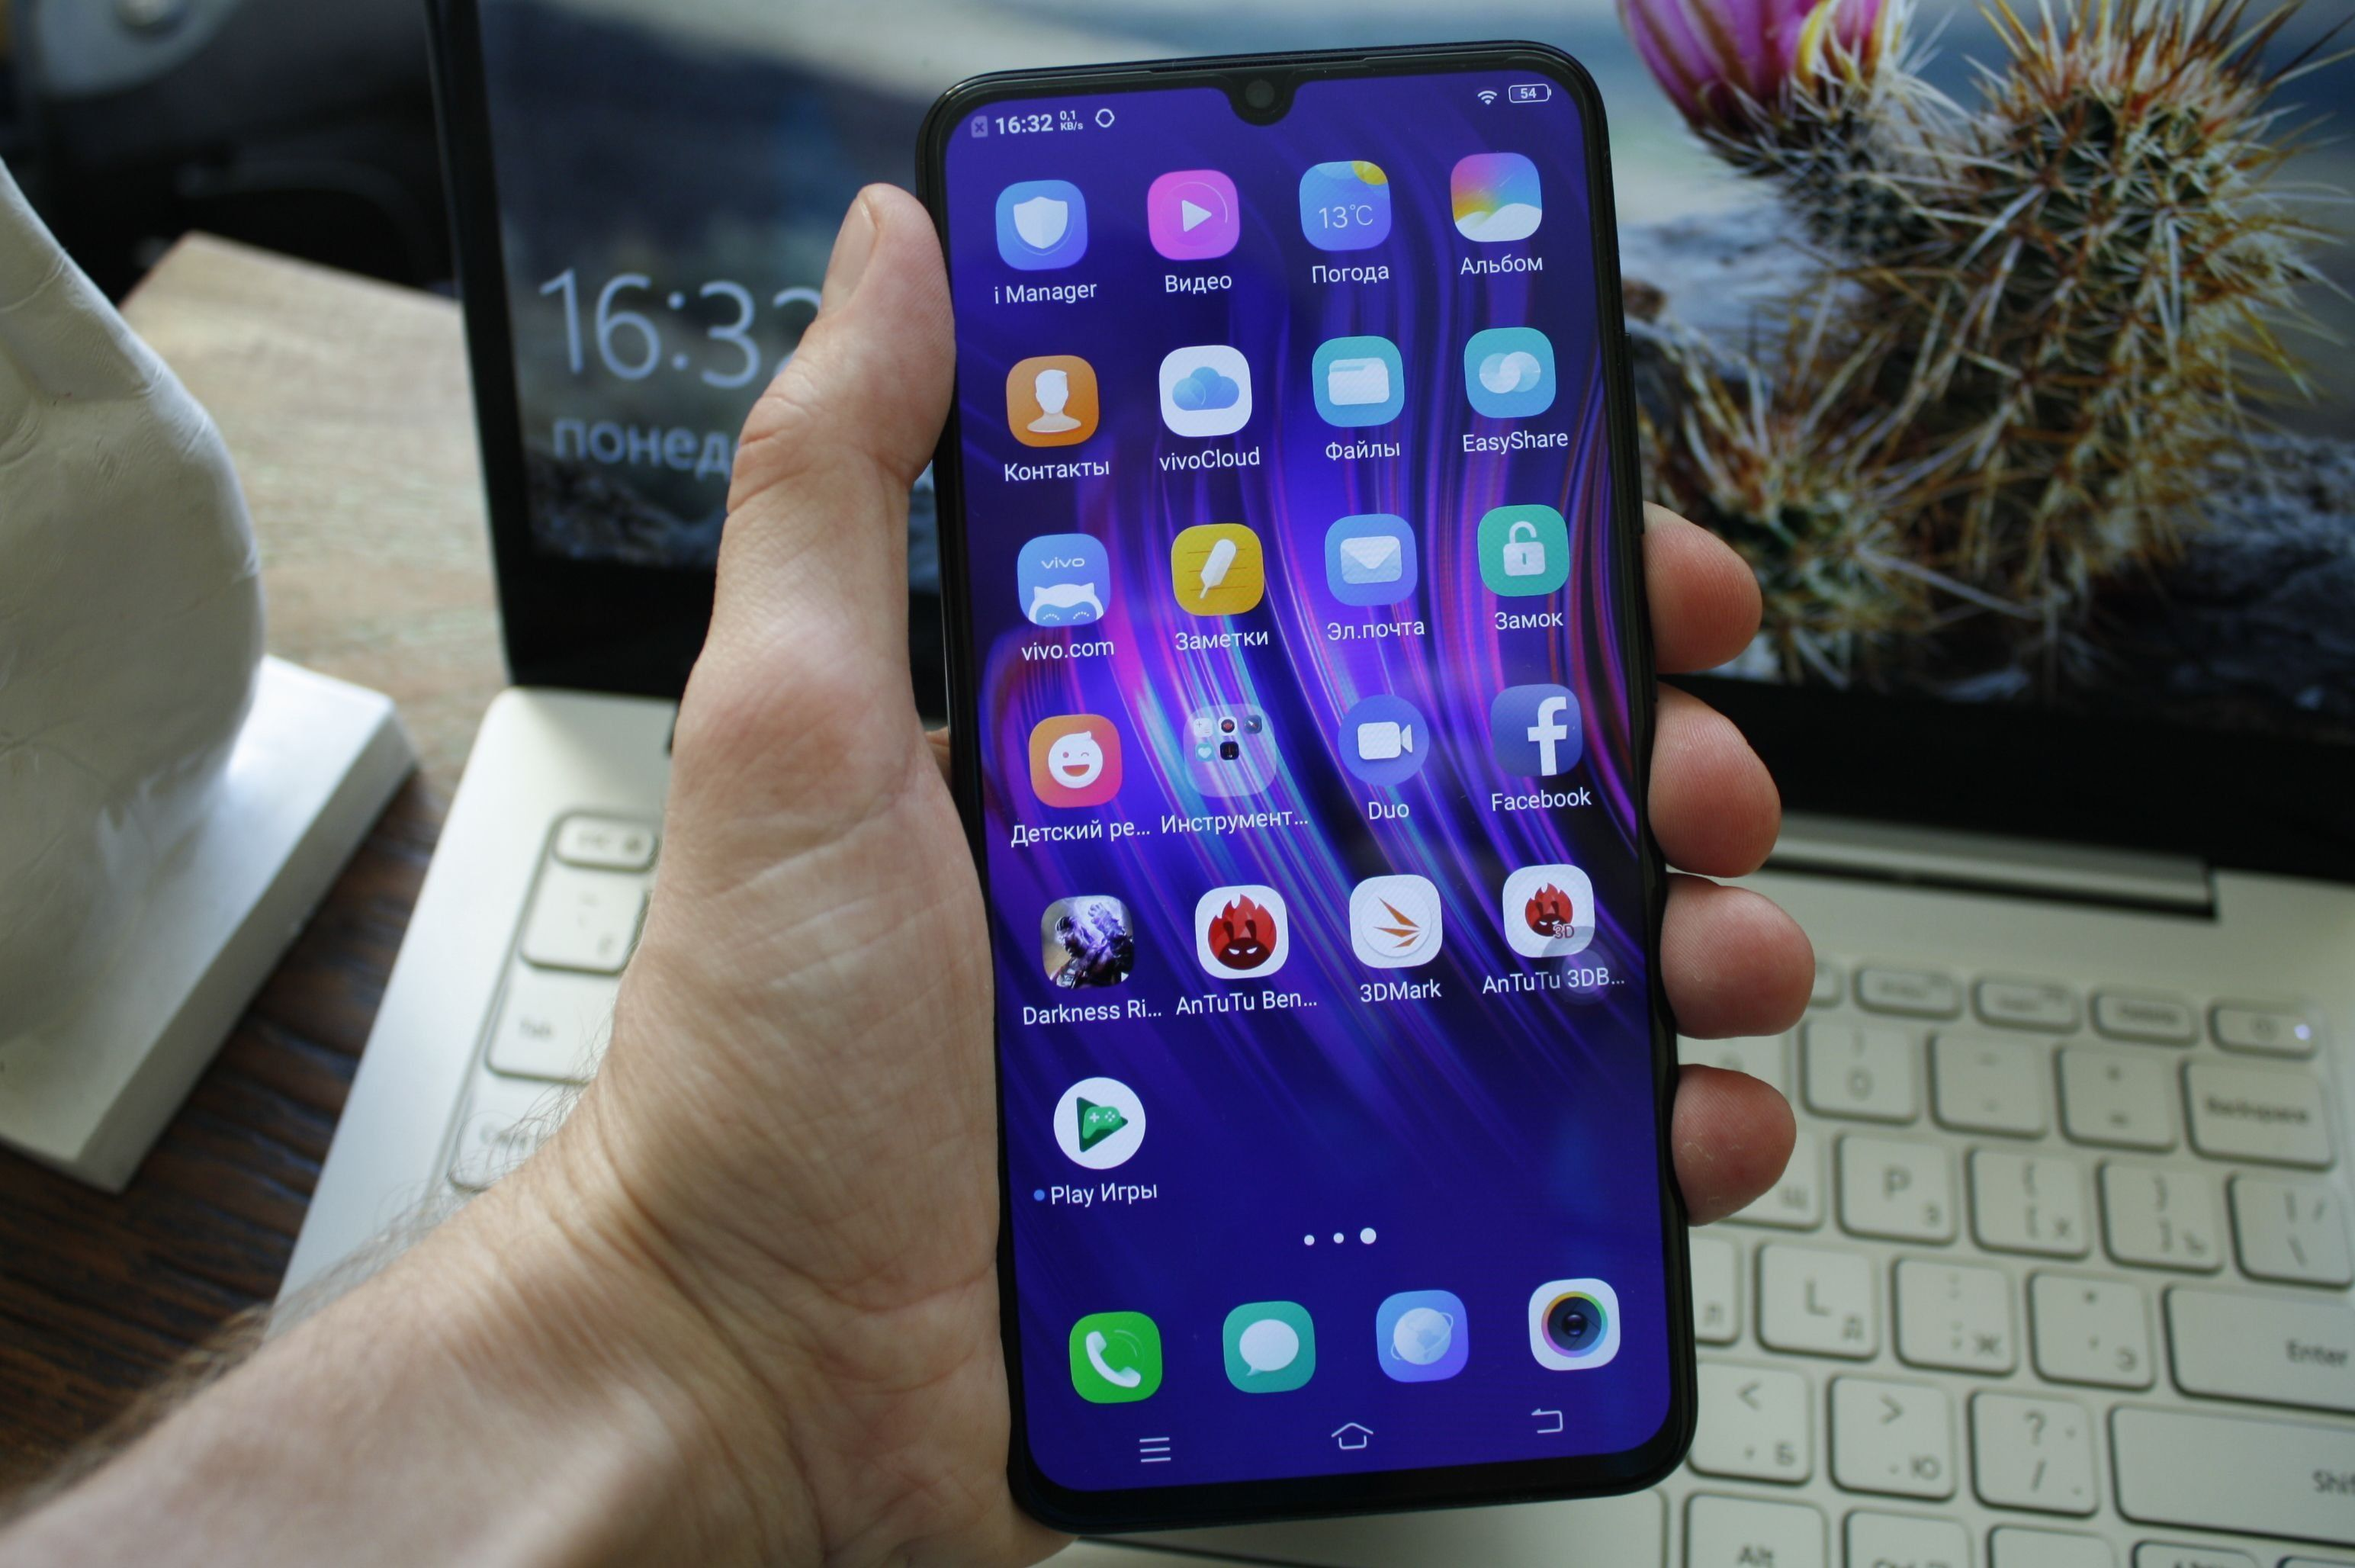 Смартфон Vivo V11 (V11 Pro) — достоинства и недостатки